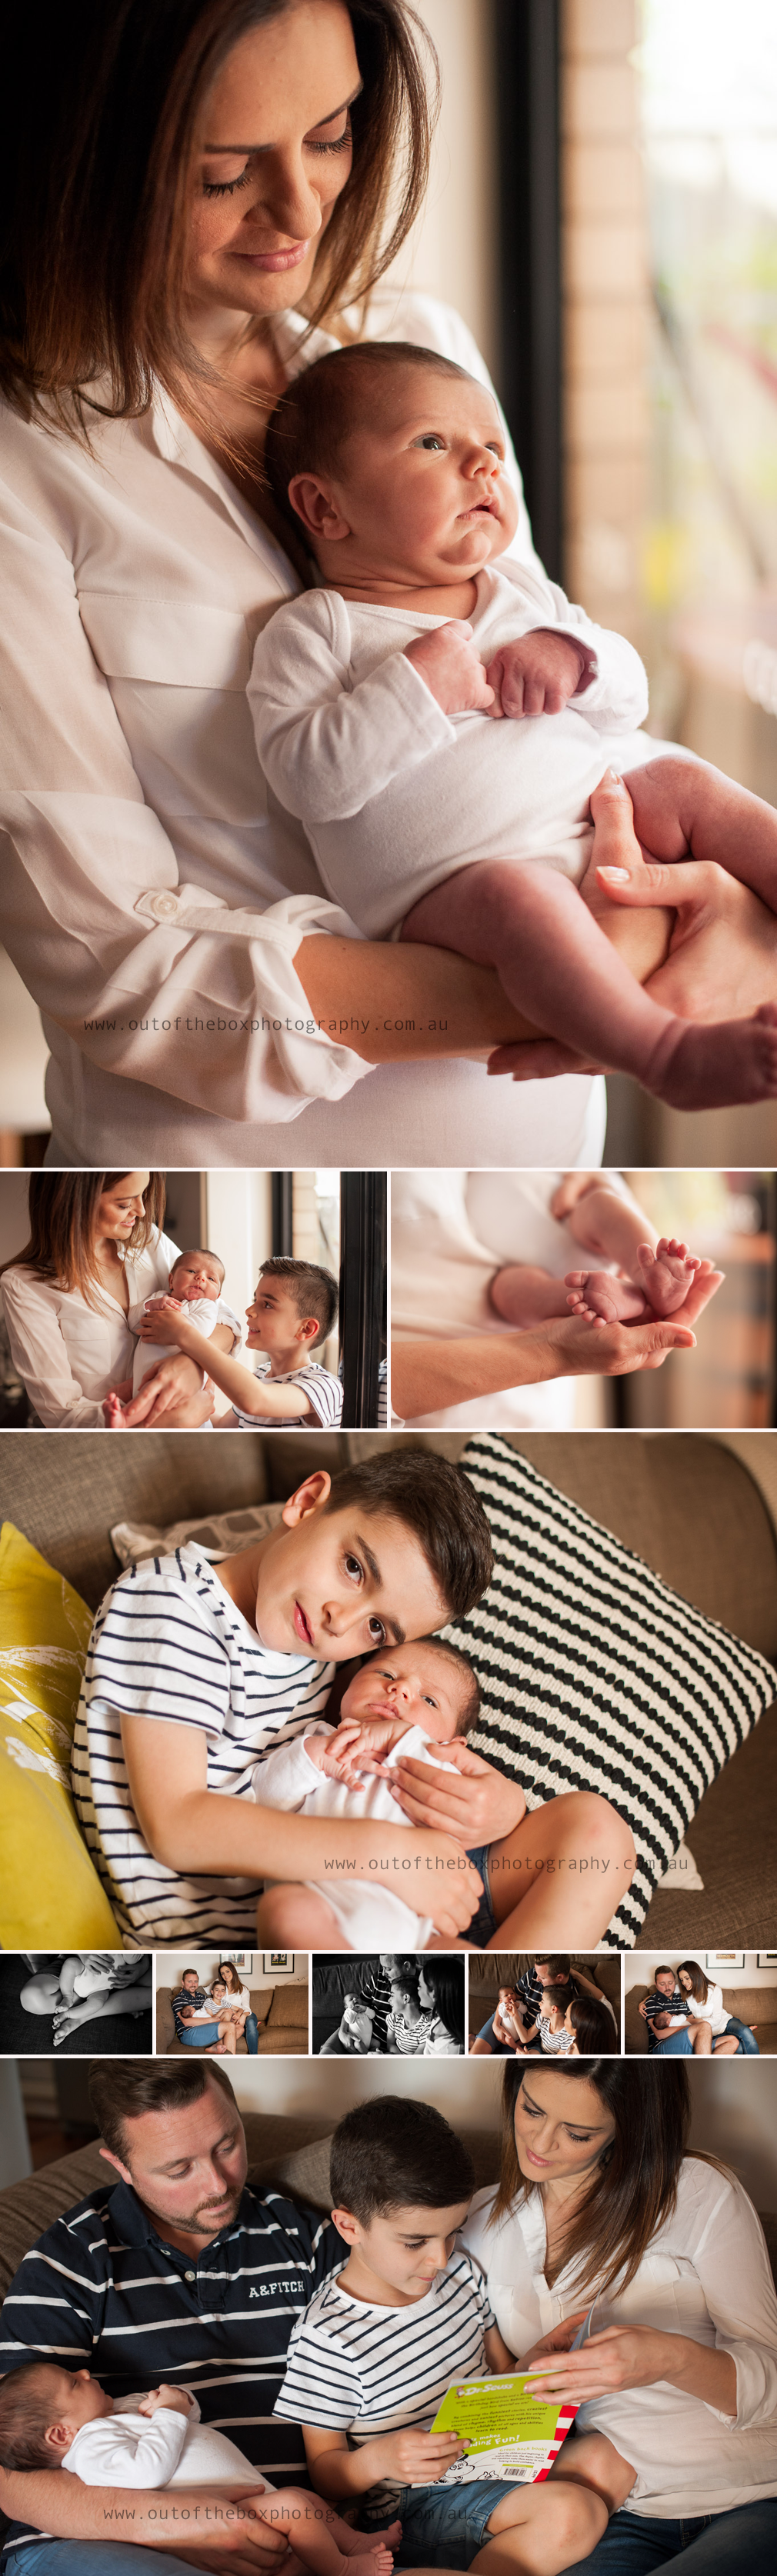 baby-boy-newborn-photo-adelaide-2